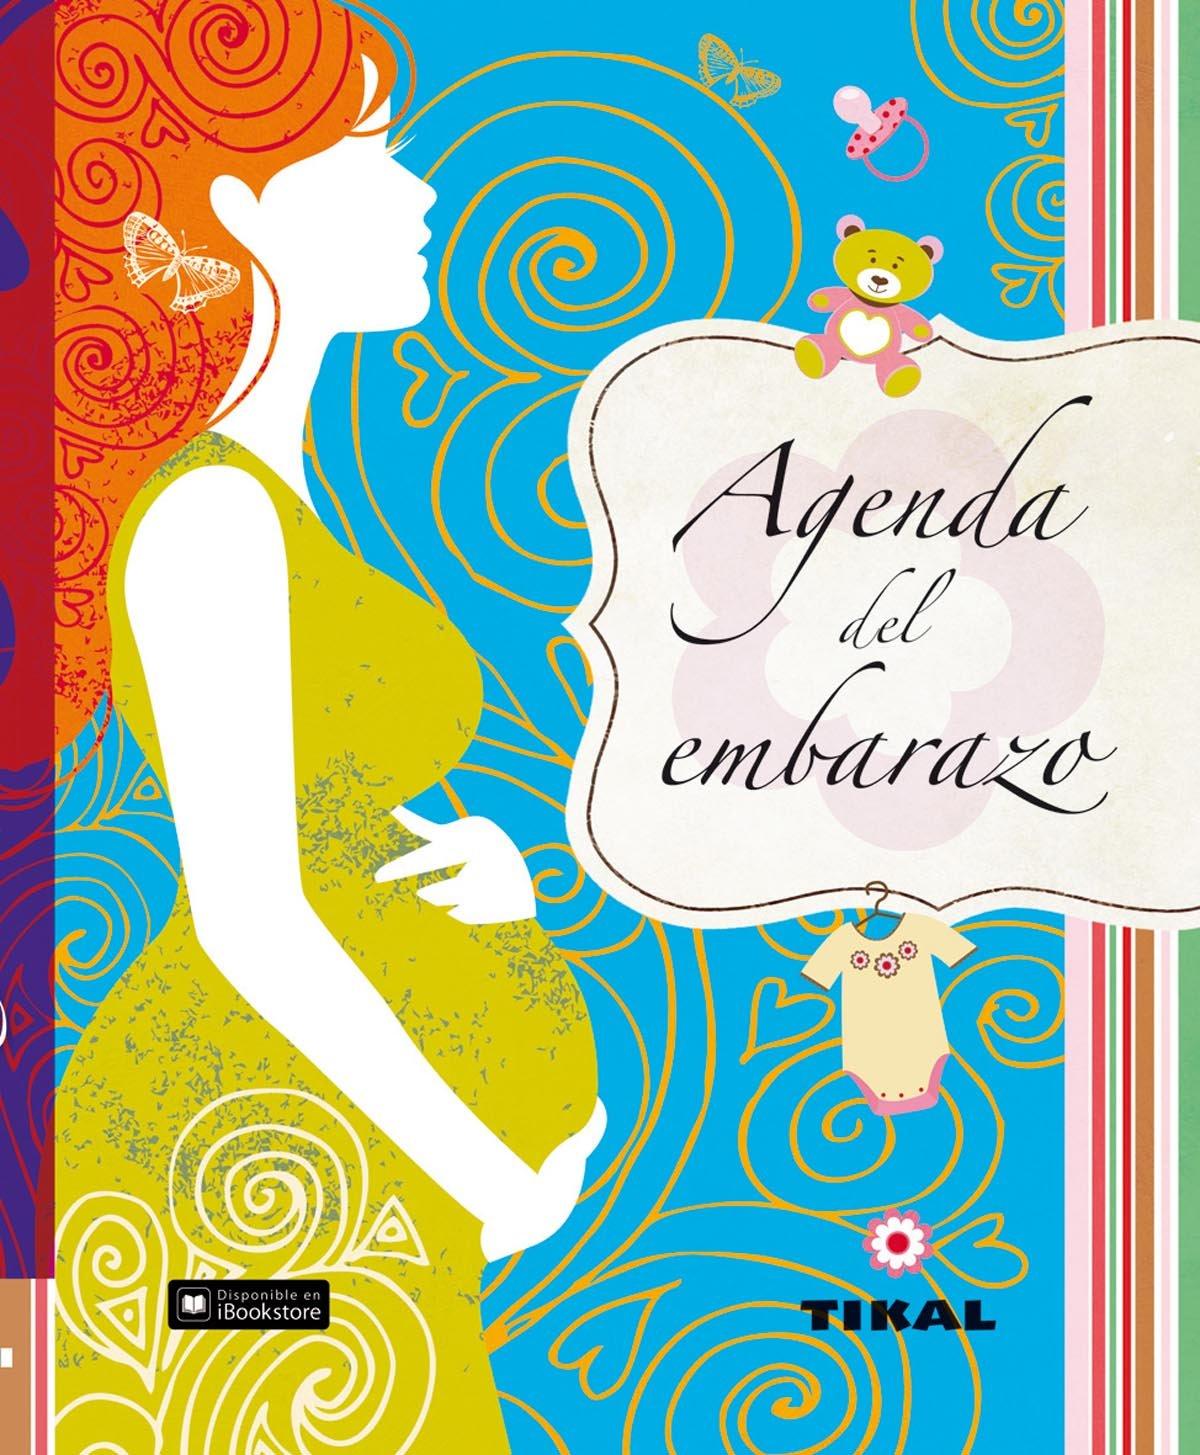 Agenda del embarazo (Agenda de mi bebé) Tapa dura – 25 nov 2013 Aa.Vv Tikal 8499282776 Anuarios